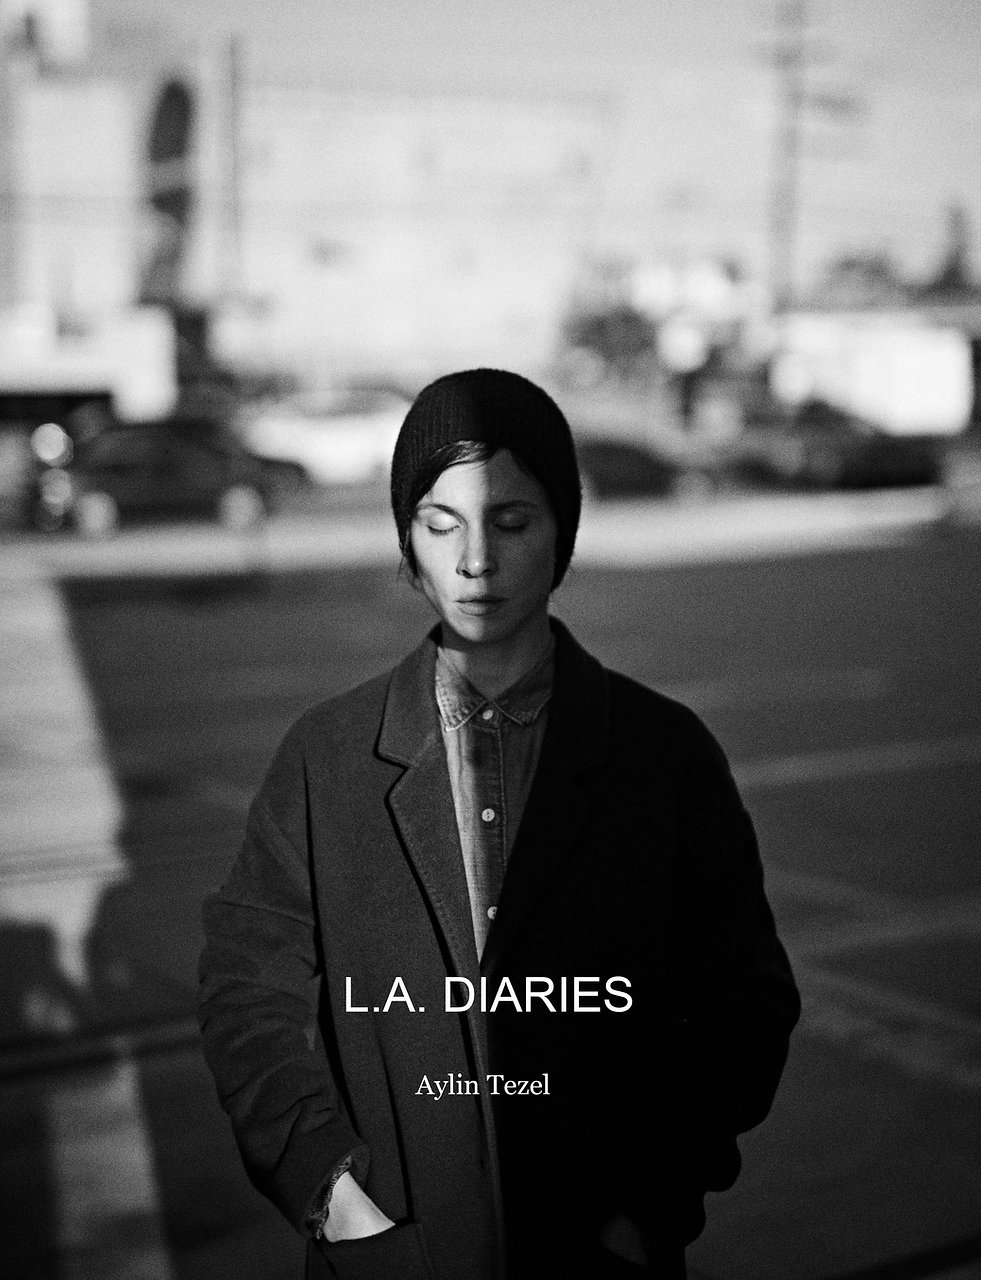 Preview_Aylin_Tezel_LA_Diaries.jpg